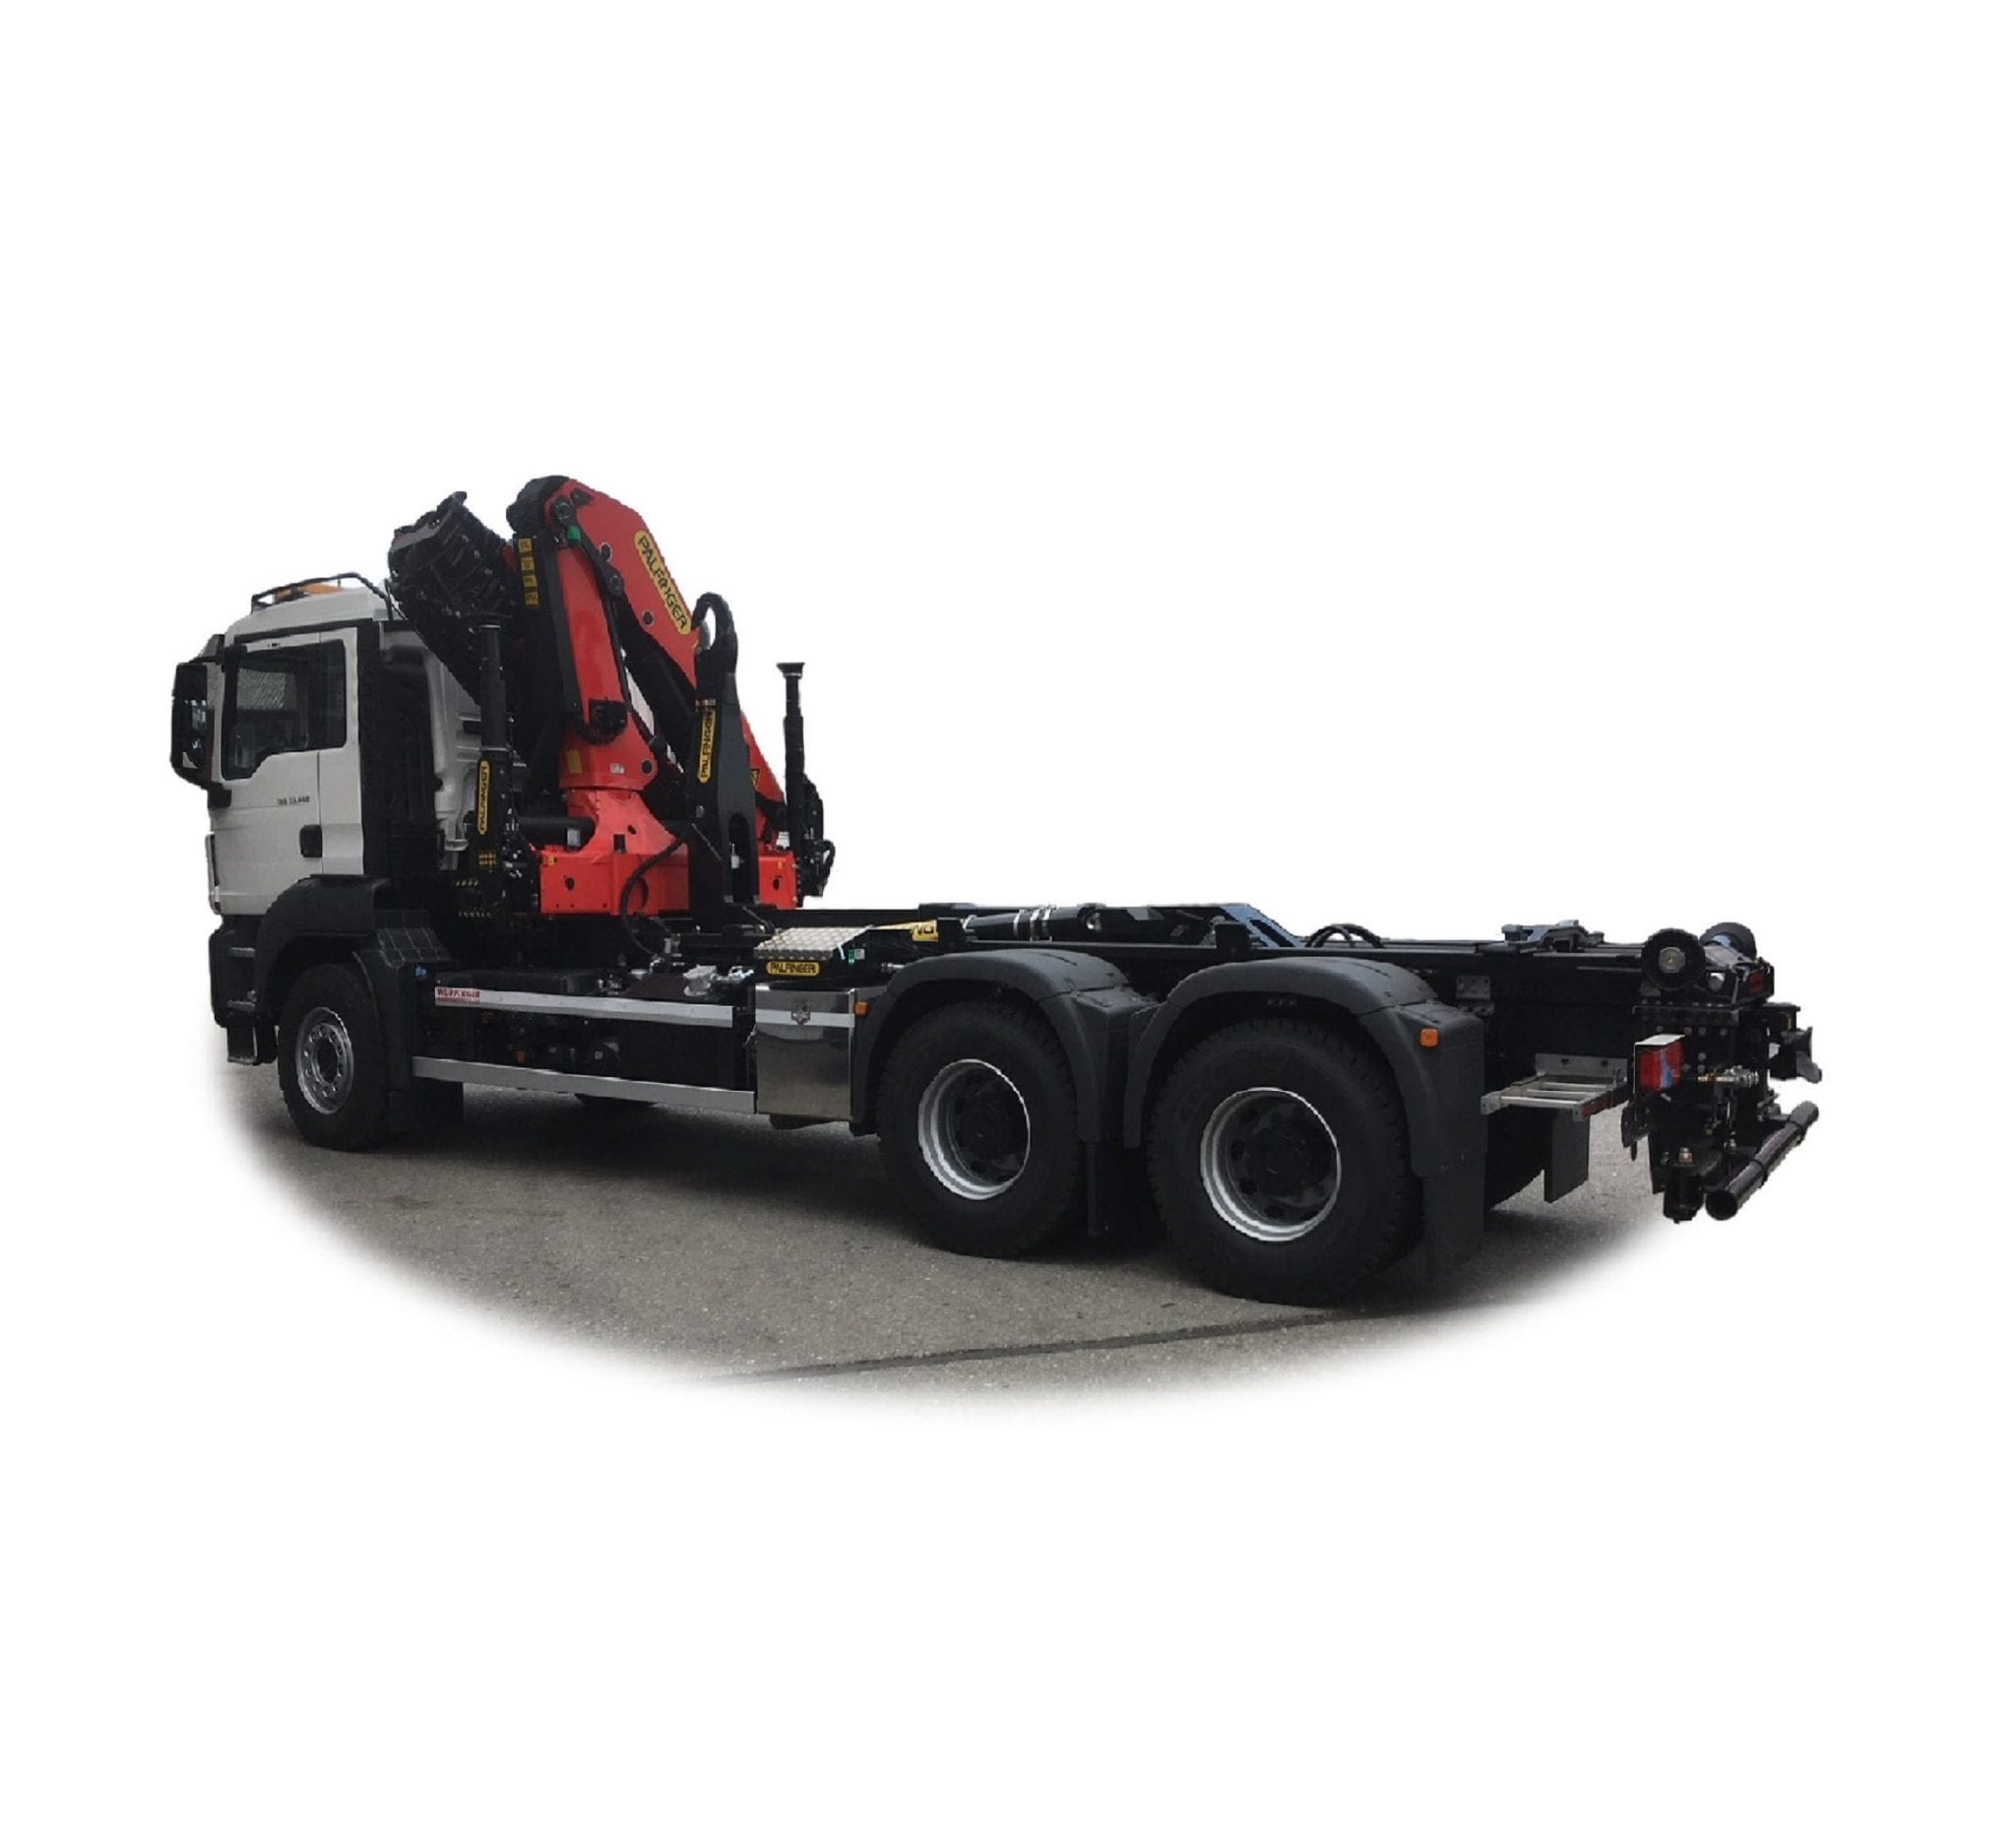 Projekte Hakengeräte Fahrzeugaufbau Wuppinger Karosseriebau